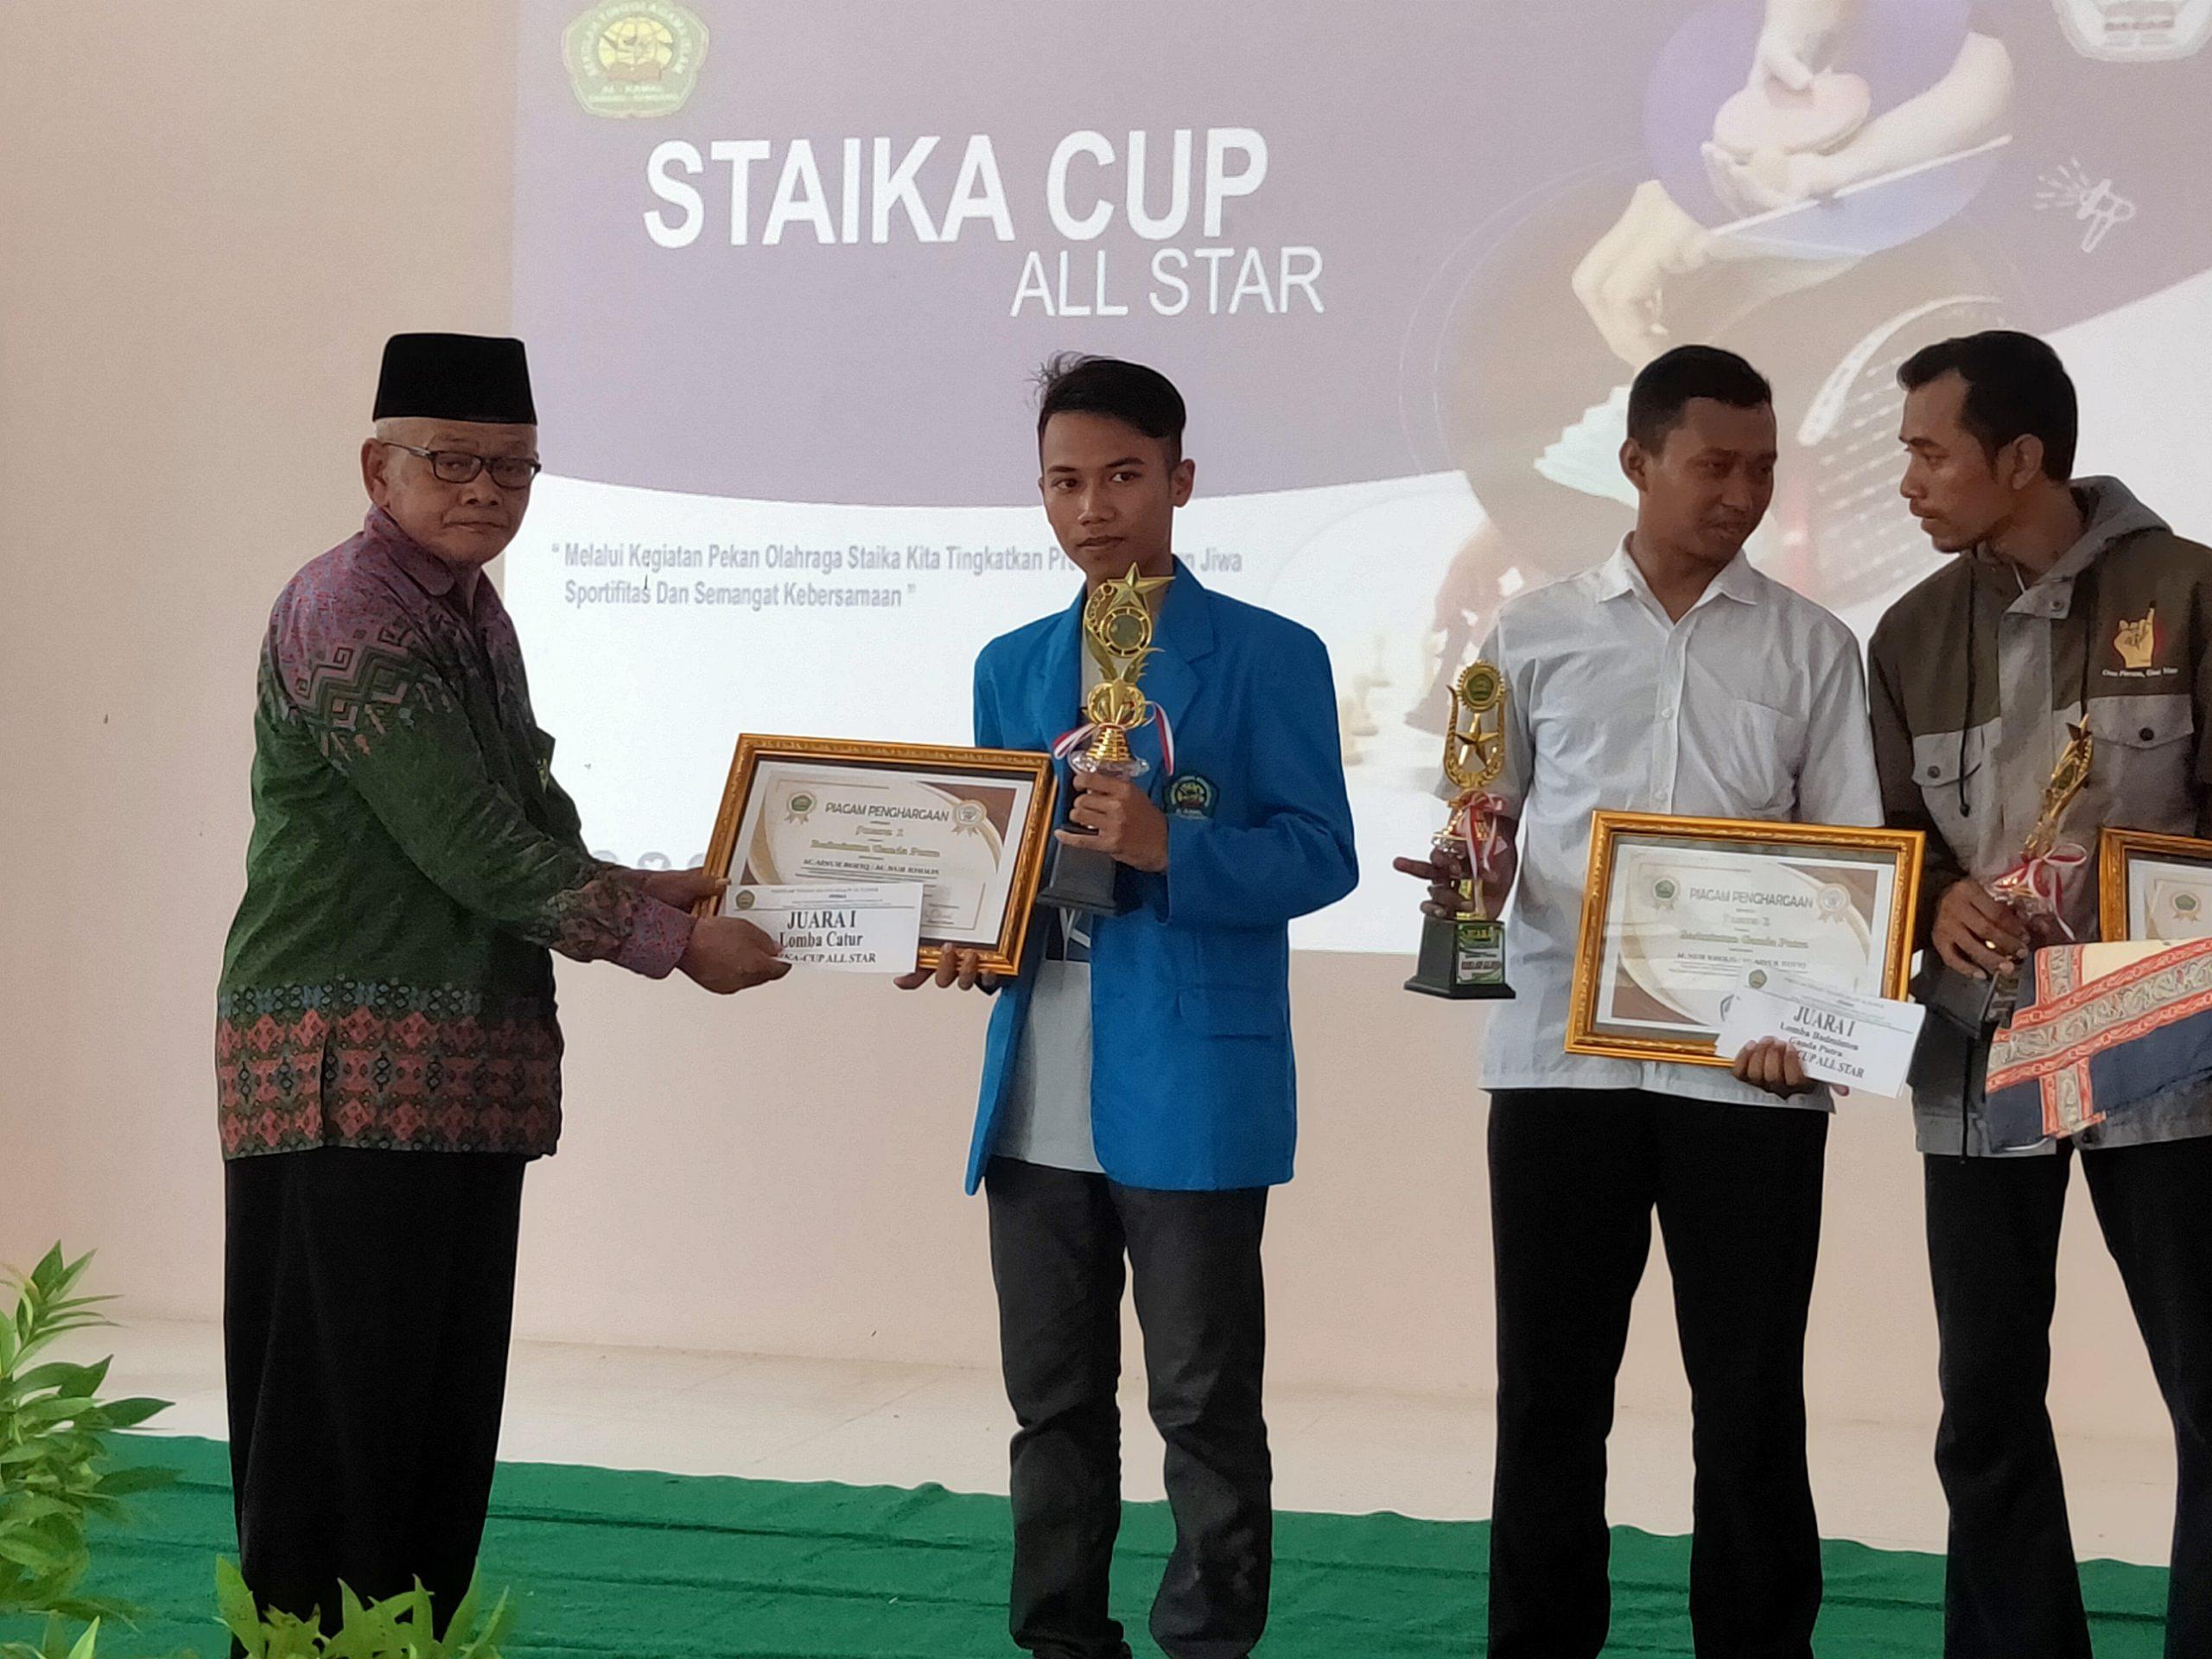 Juara I CATUR Putra (STAIKA CUP)